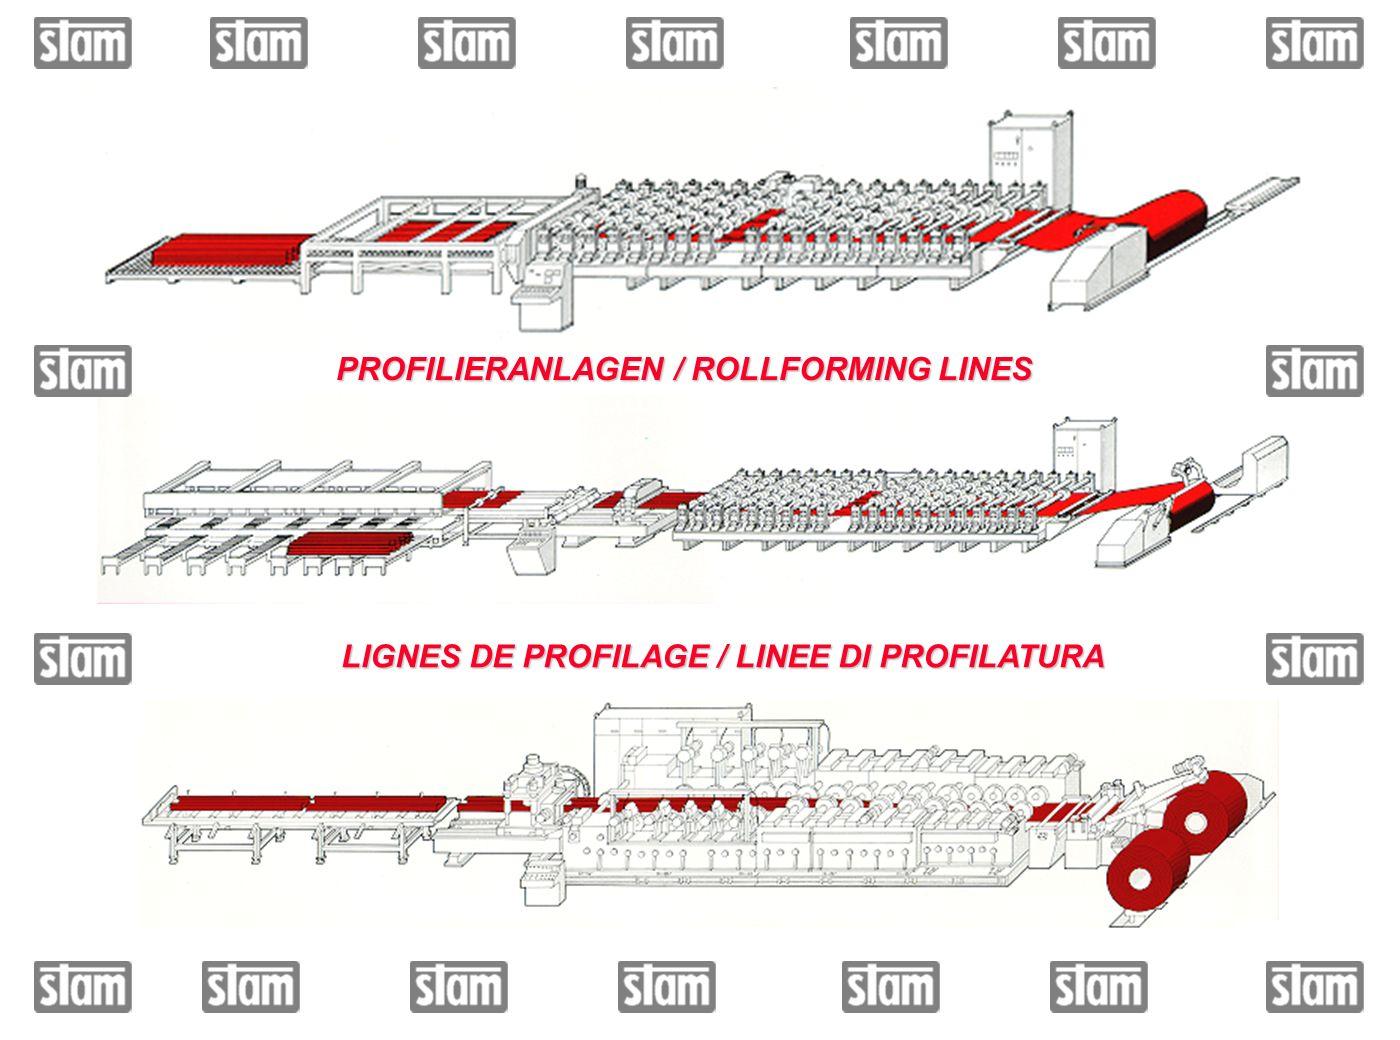 C 322.00 ROLLFORMING LINE FOR U BEAMS (TRUCK SIDE MEMBERS) PROFILIERANLAGE FÜR LKW-LÄNGSTRÄGER (U-PROFILE) PROFILIERANLAGE FÜR LKW-LÄNGSTRÄGER (U-PROFILE)